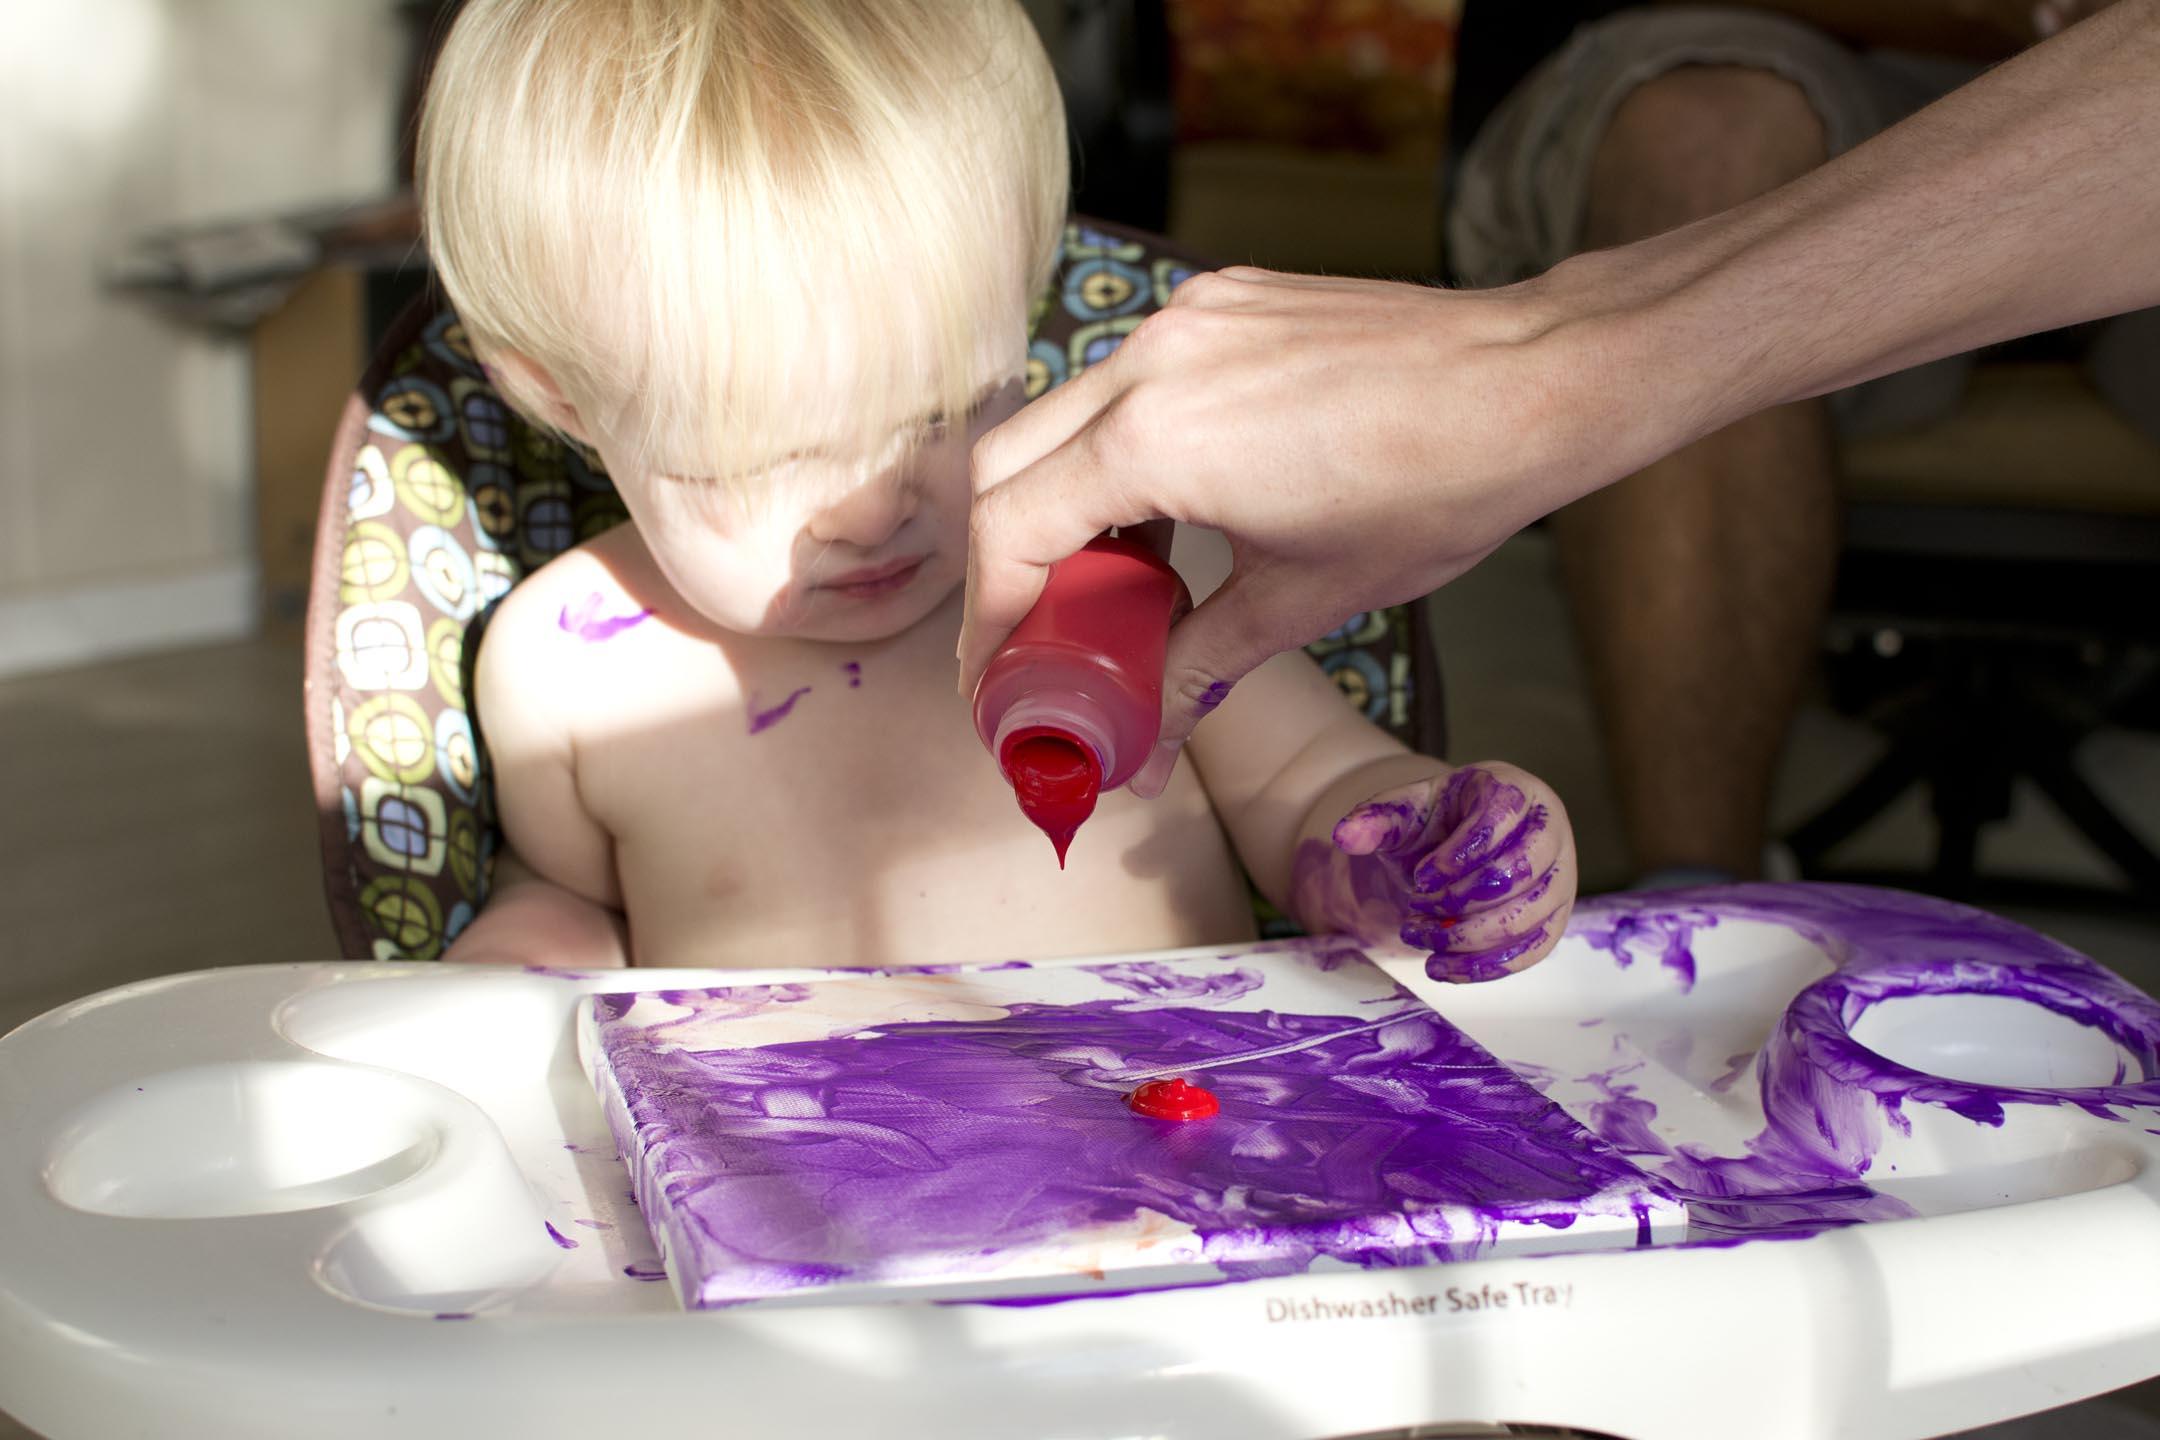 bailey6_painting_lakehouse_10-10-15.jpg